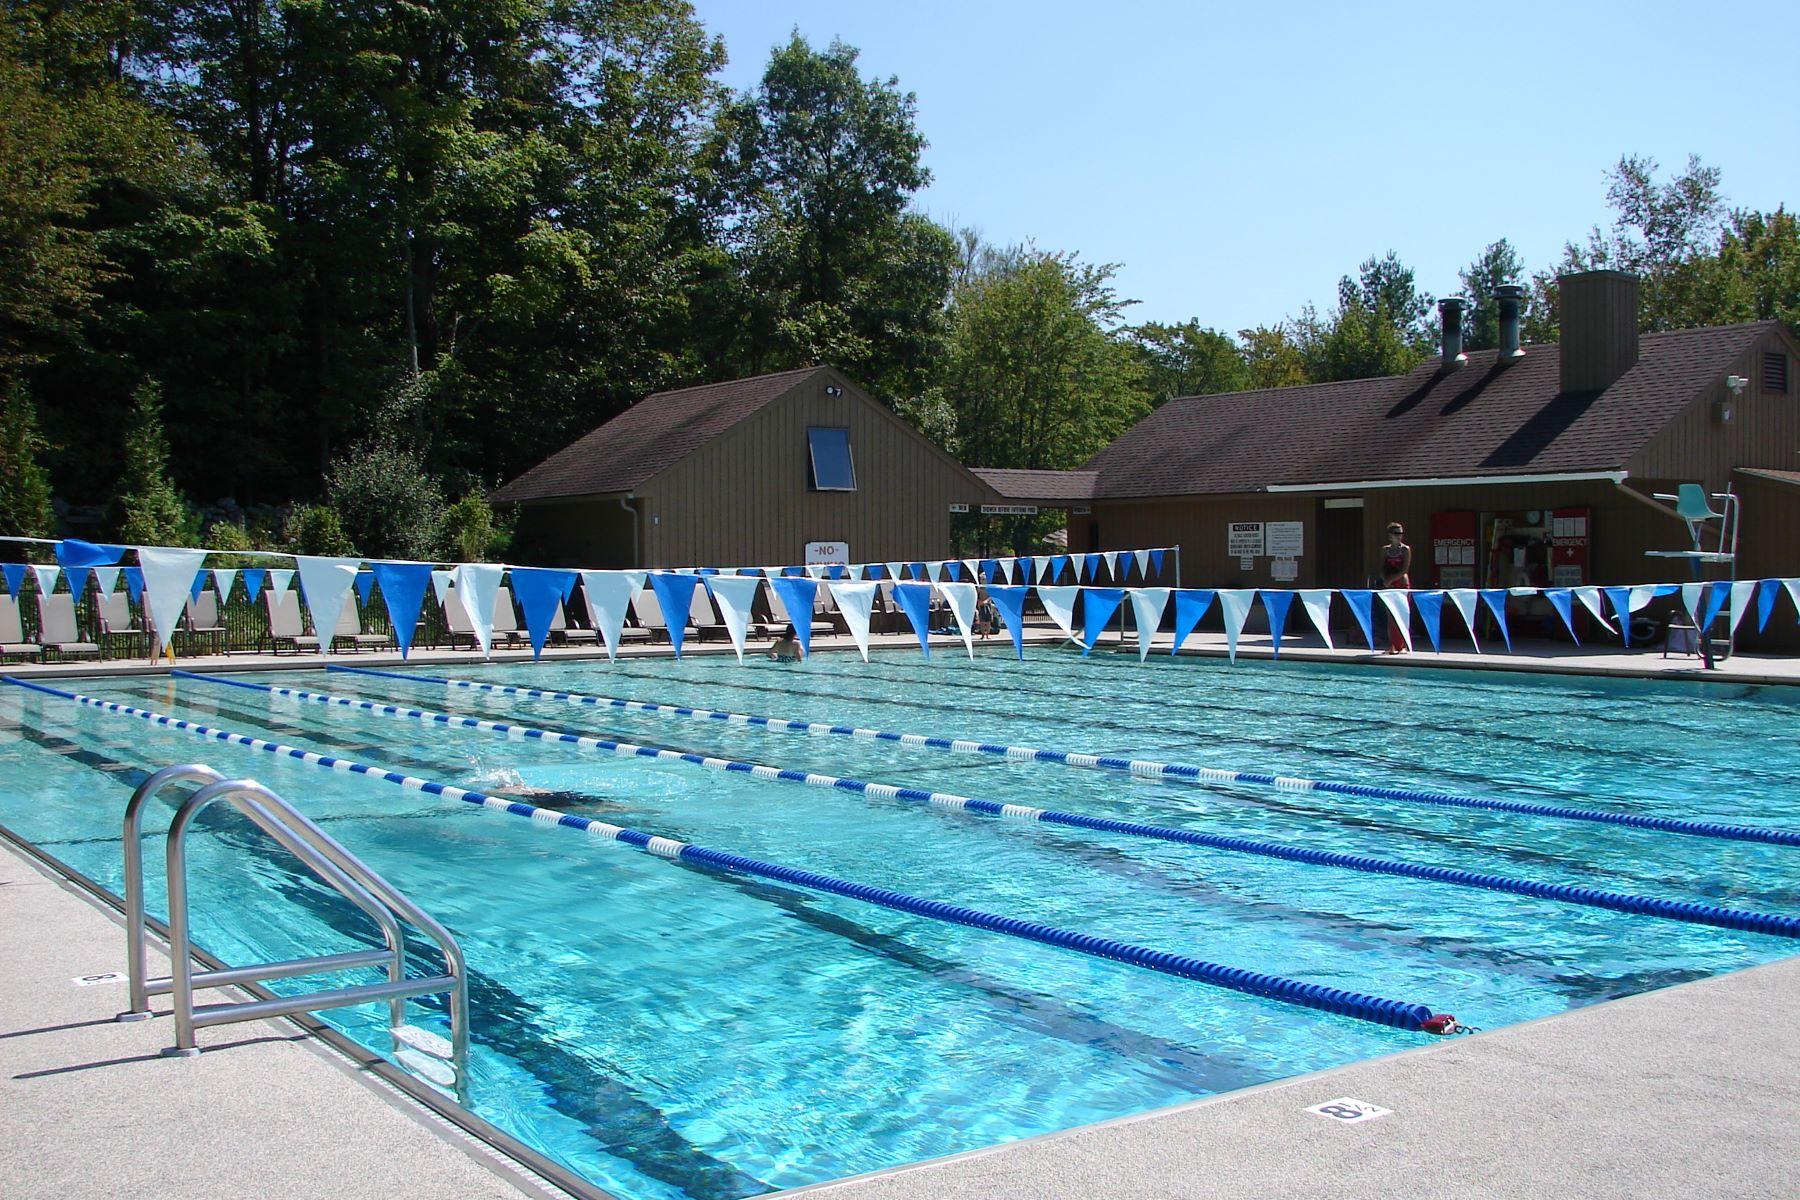 Additional photo for property listing at Woodridge Lake Single Level Living 55 Shelbourne Drive 哥珊地, 康涅狄格州 06756 美国